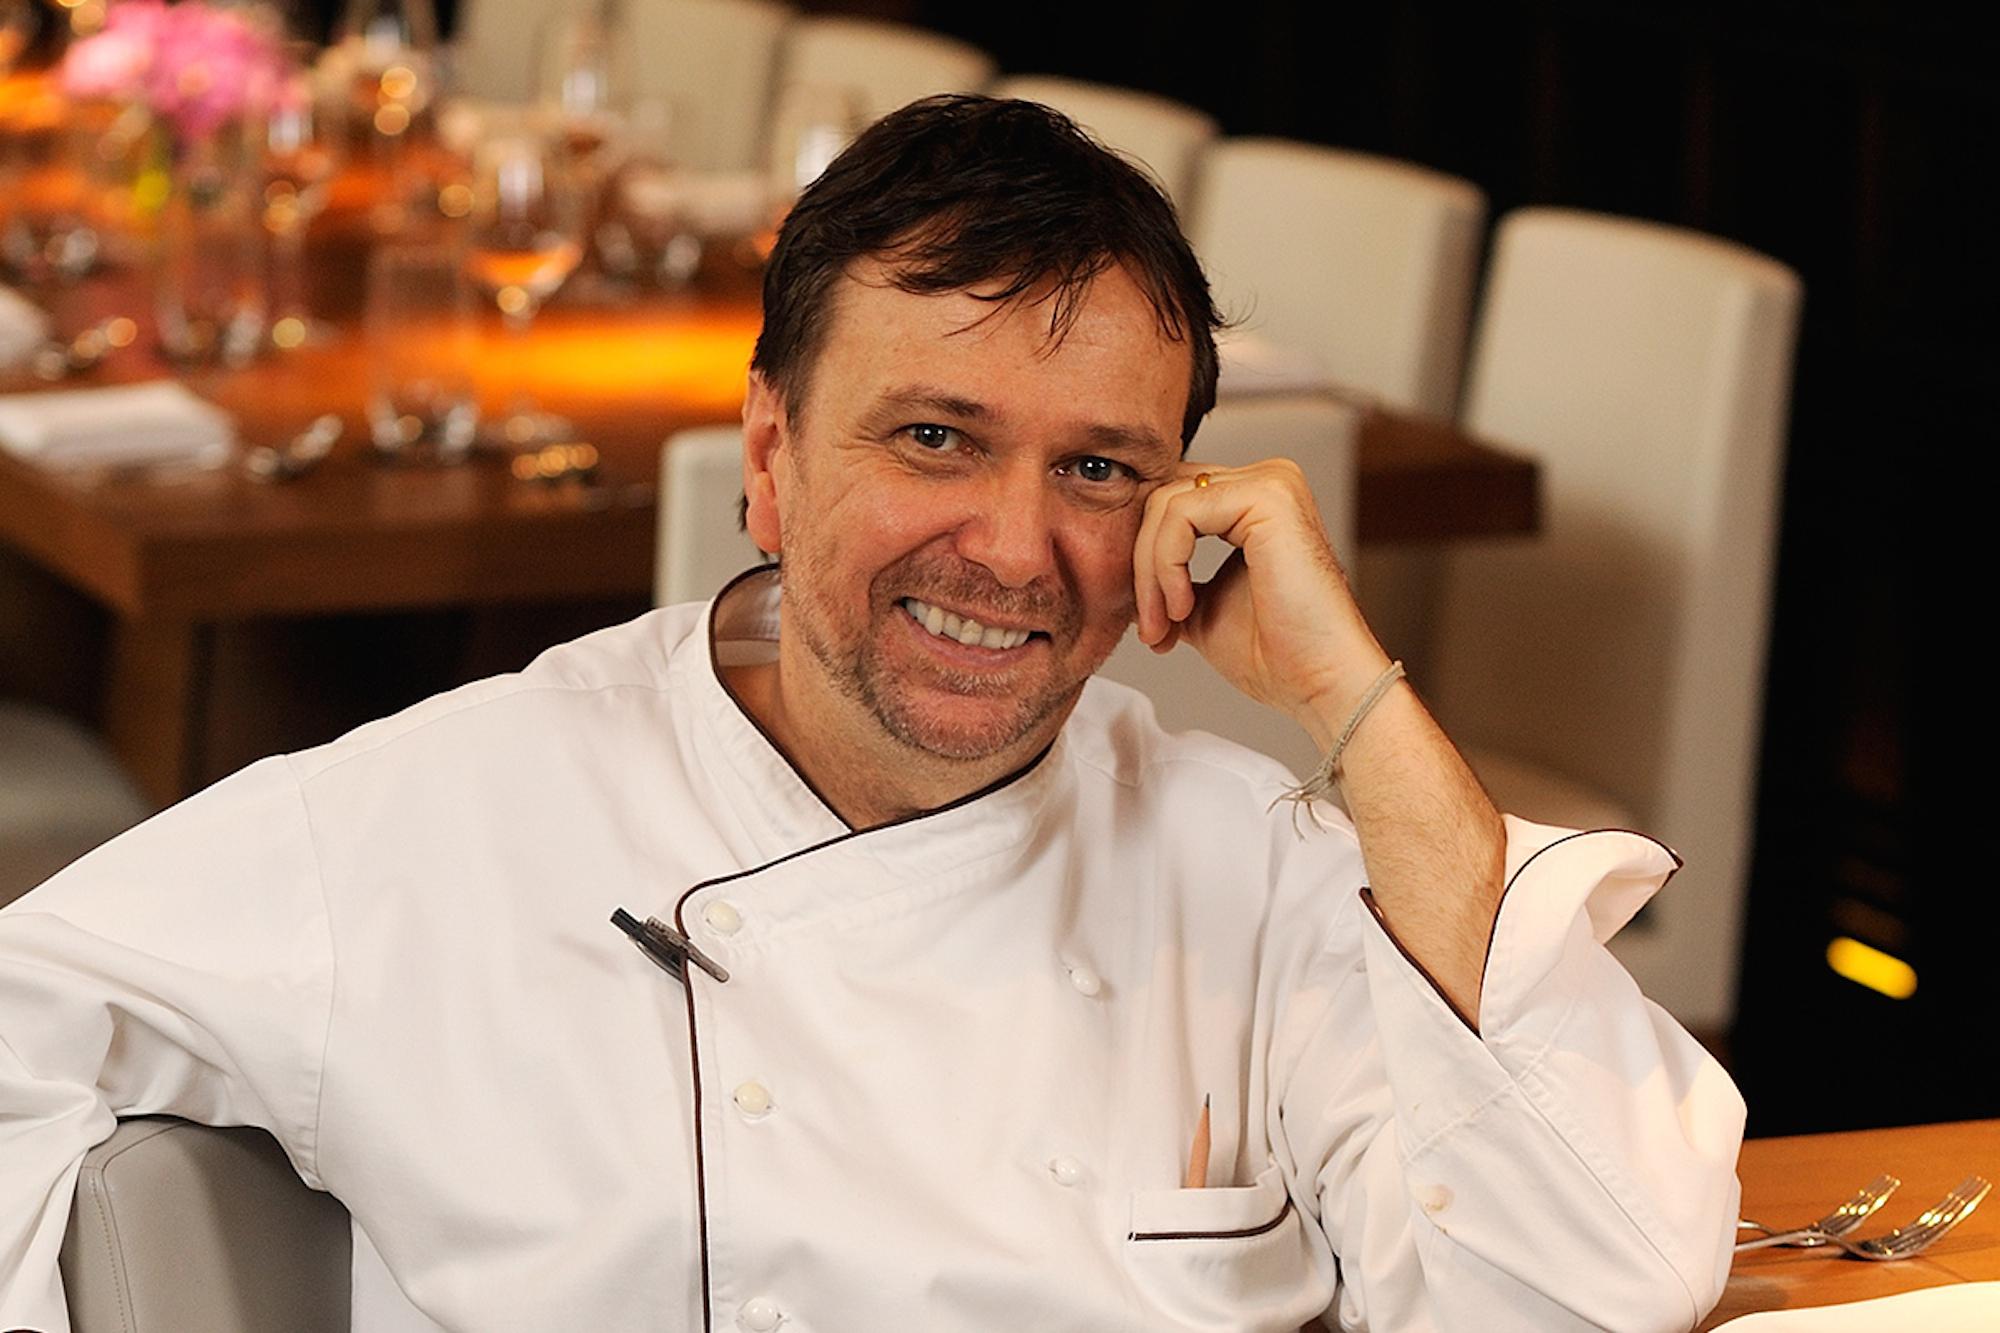 World's best chefs on their best food experiences | CNN Travel